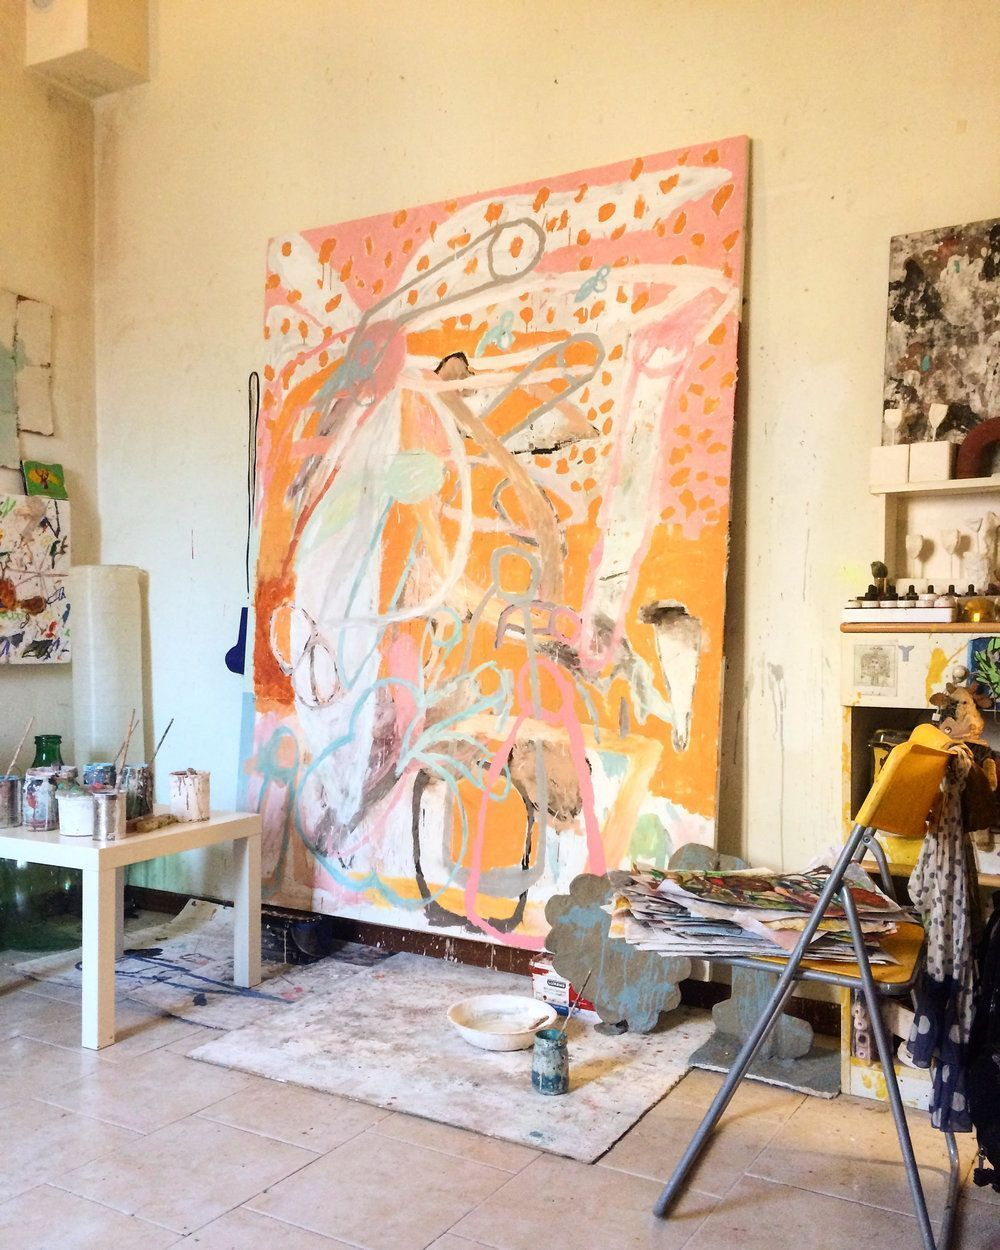 Apr 12 work(space) in progress | Paintings, Artist and Artist studios